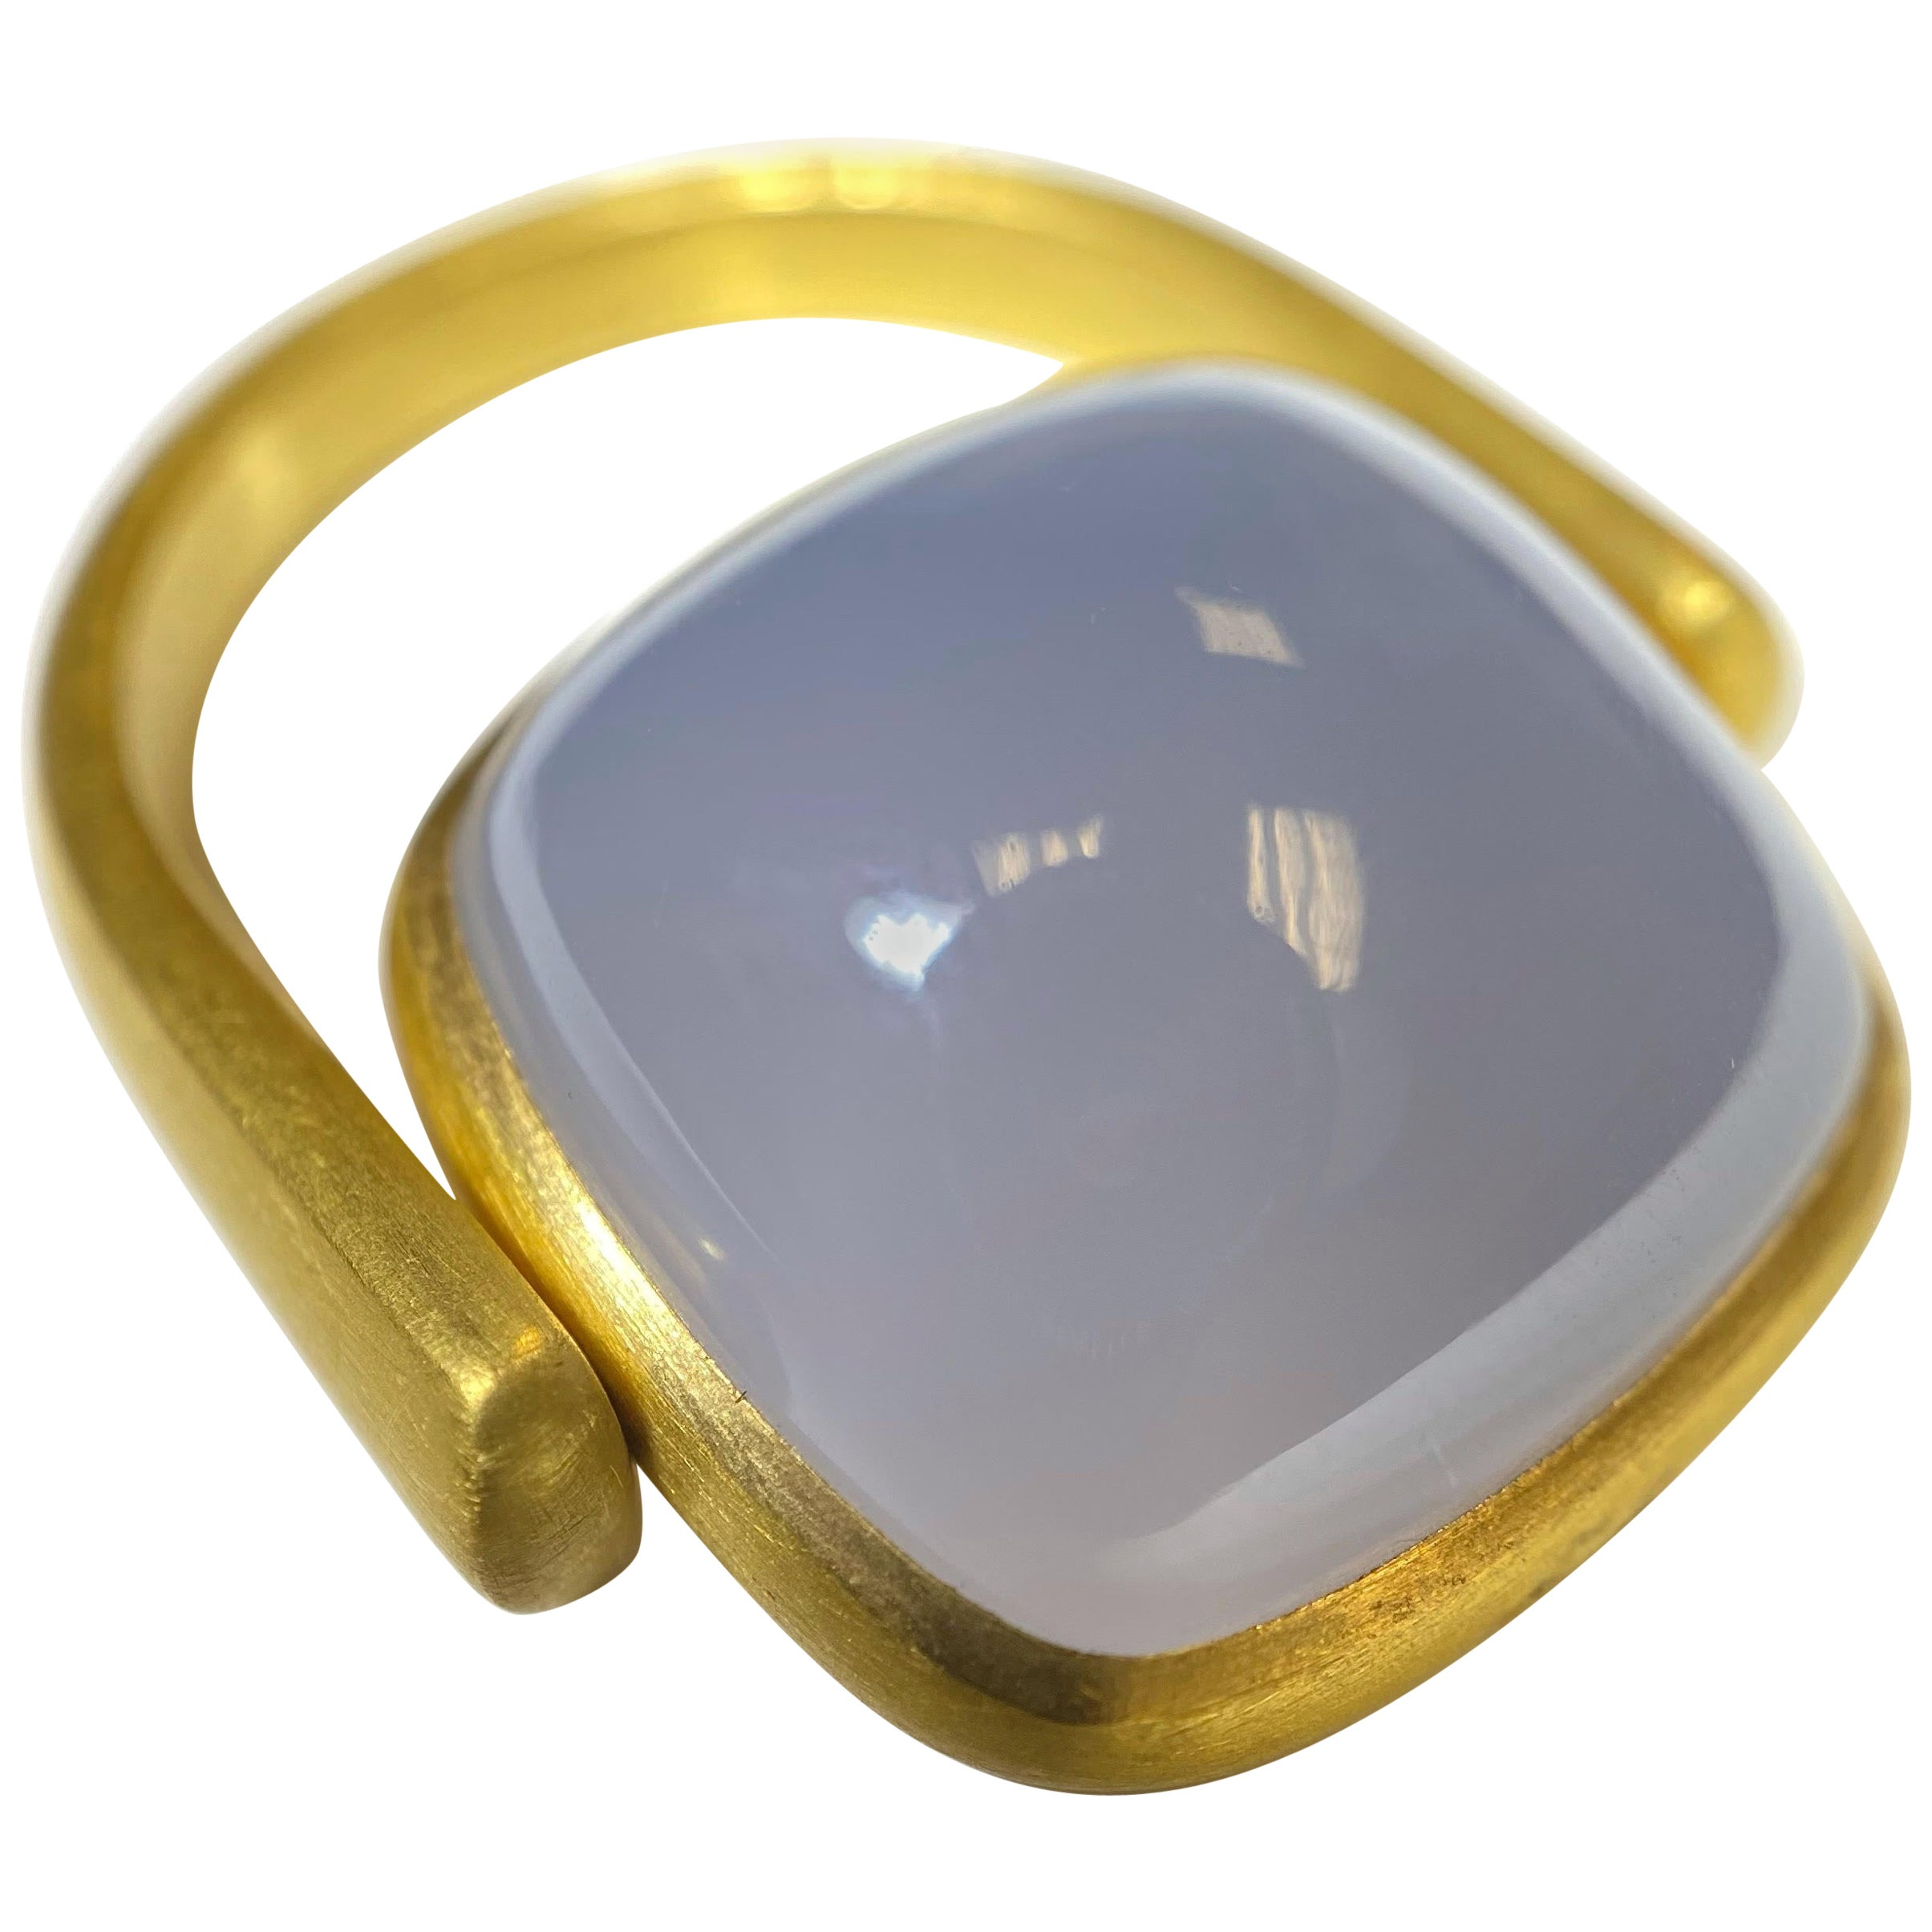 Chalcedony Flip Ring in 22 Karat Gold, A2 by Arunashi